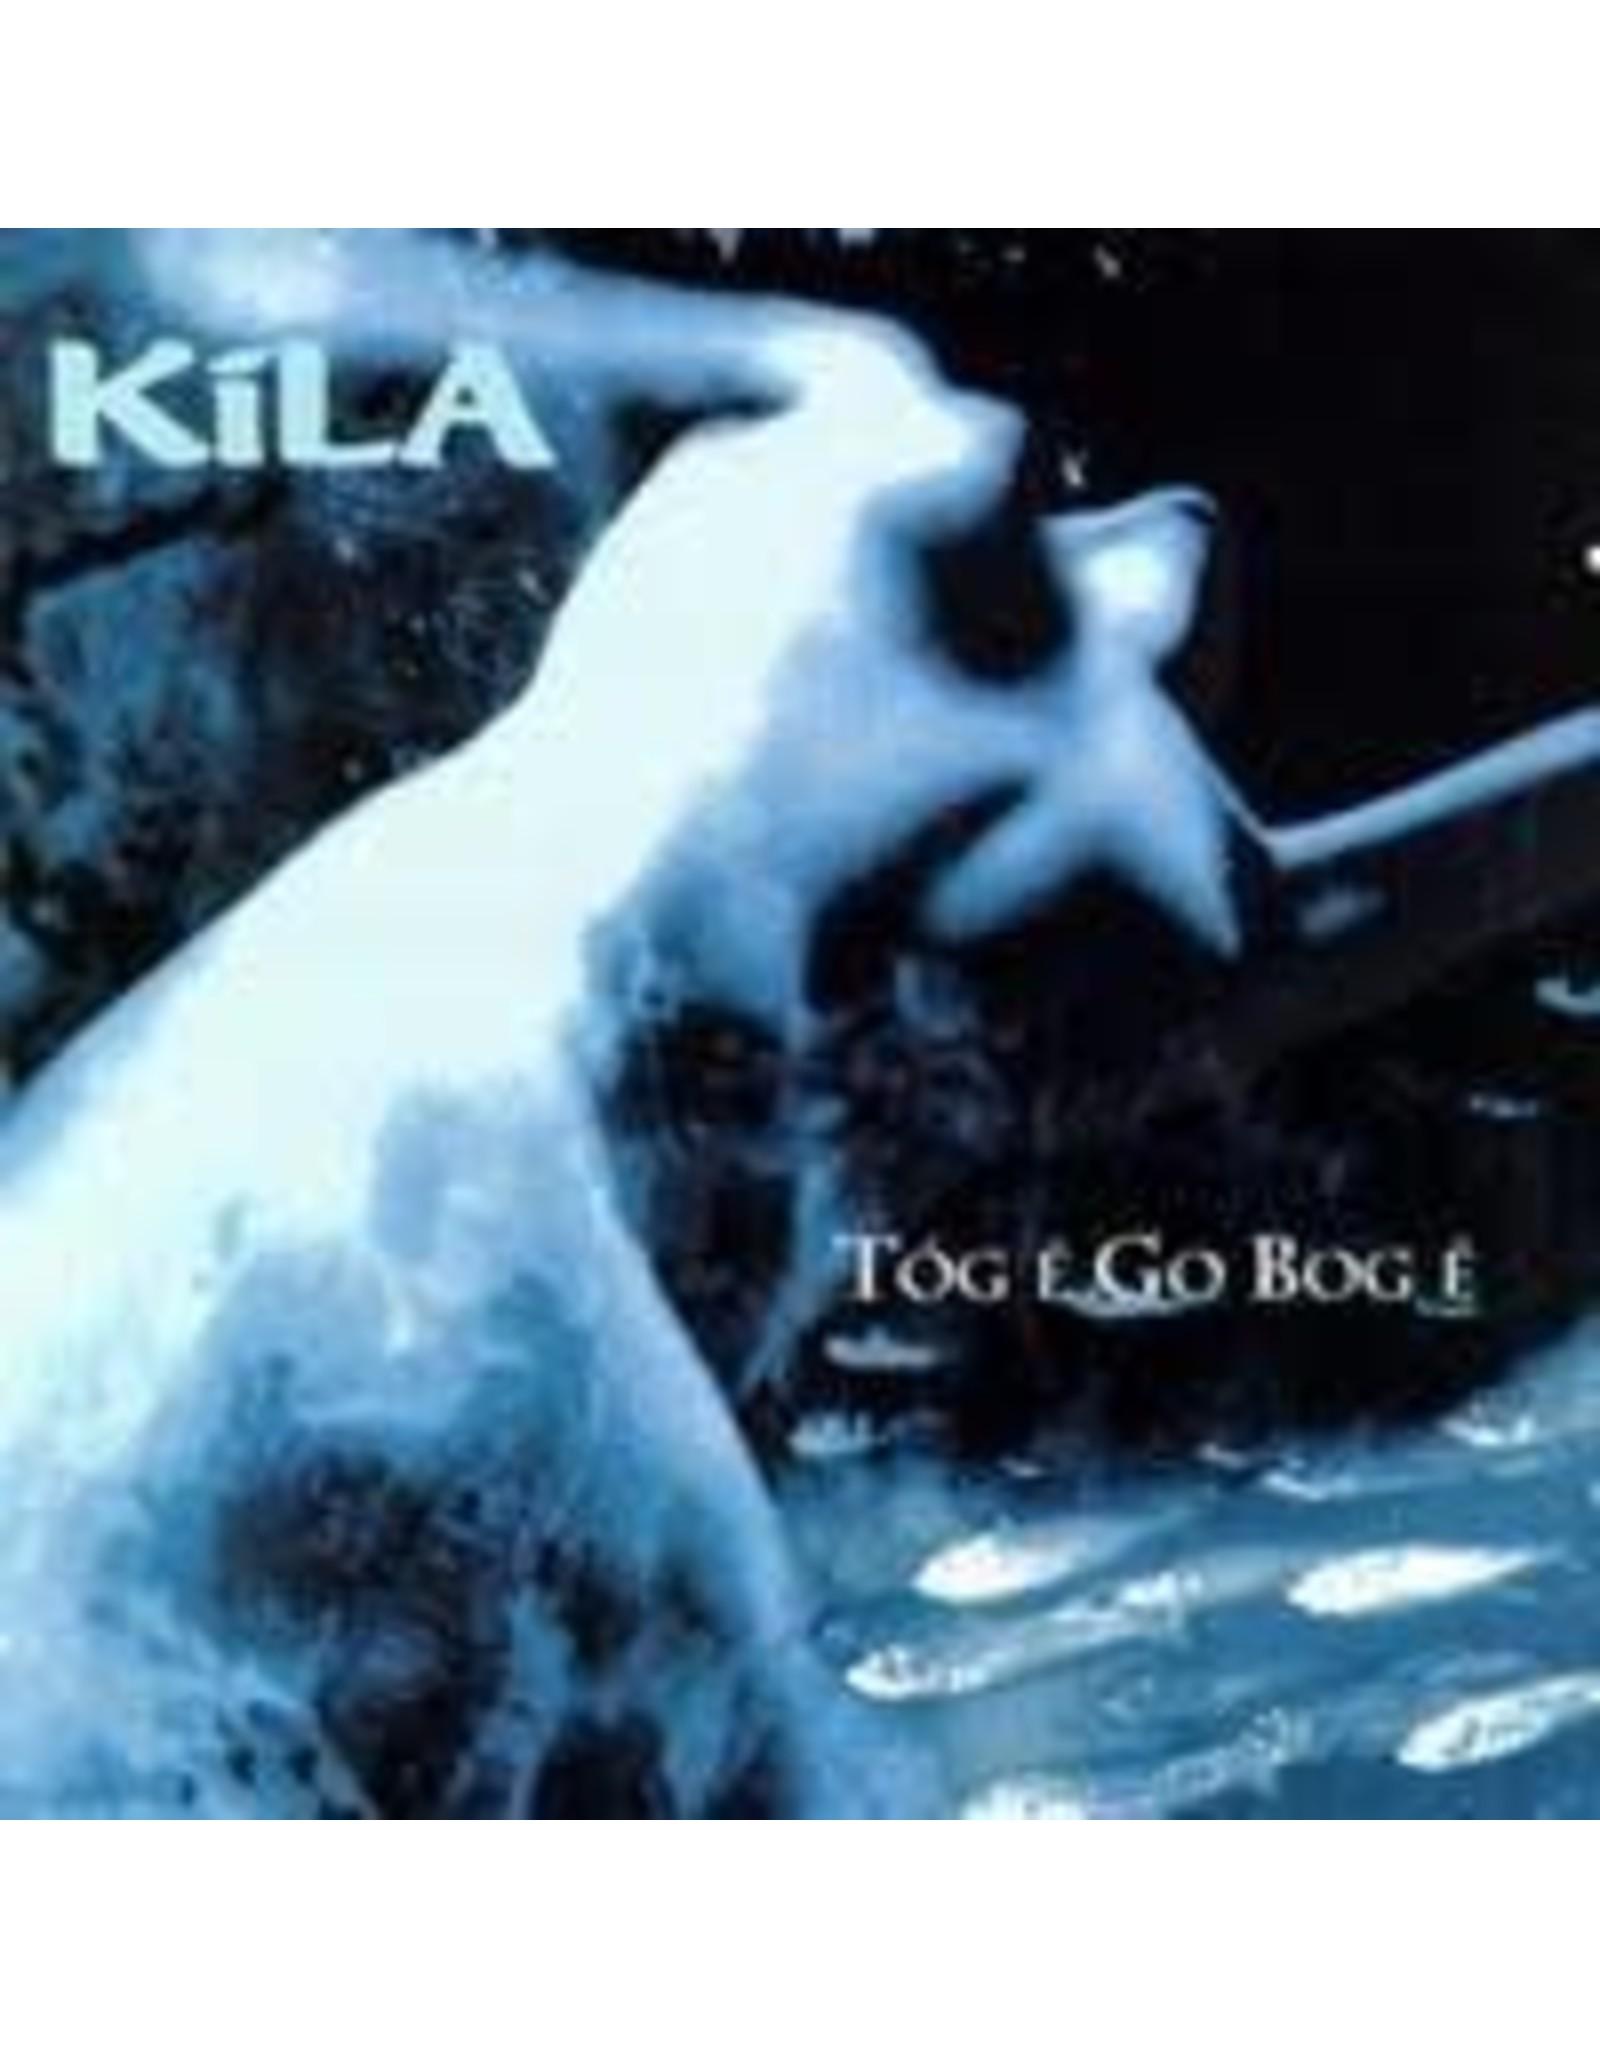 Kila Kila Tog E Go Bog E CD